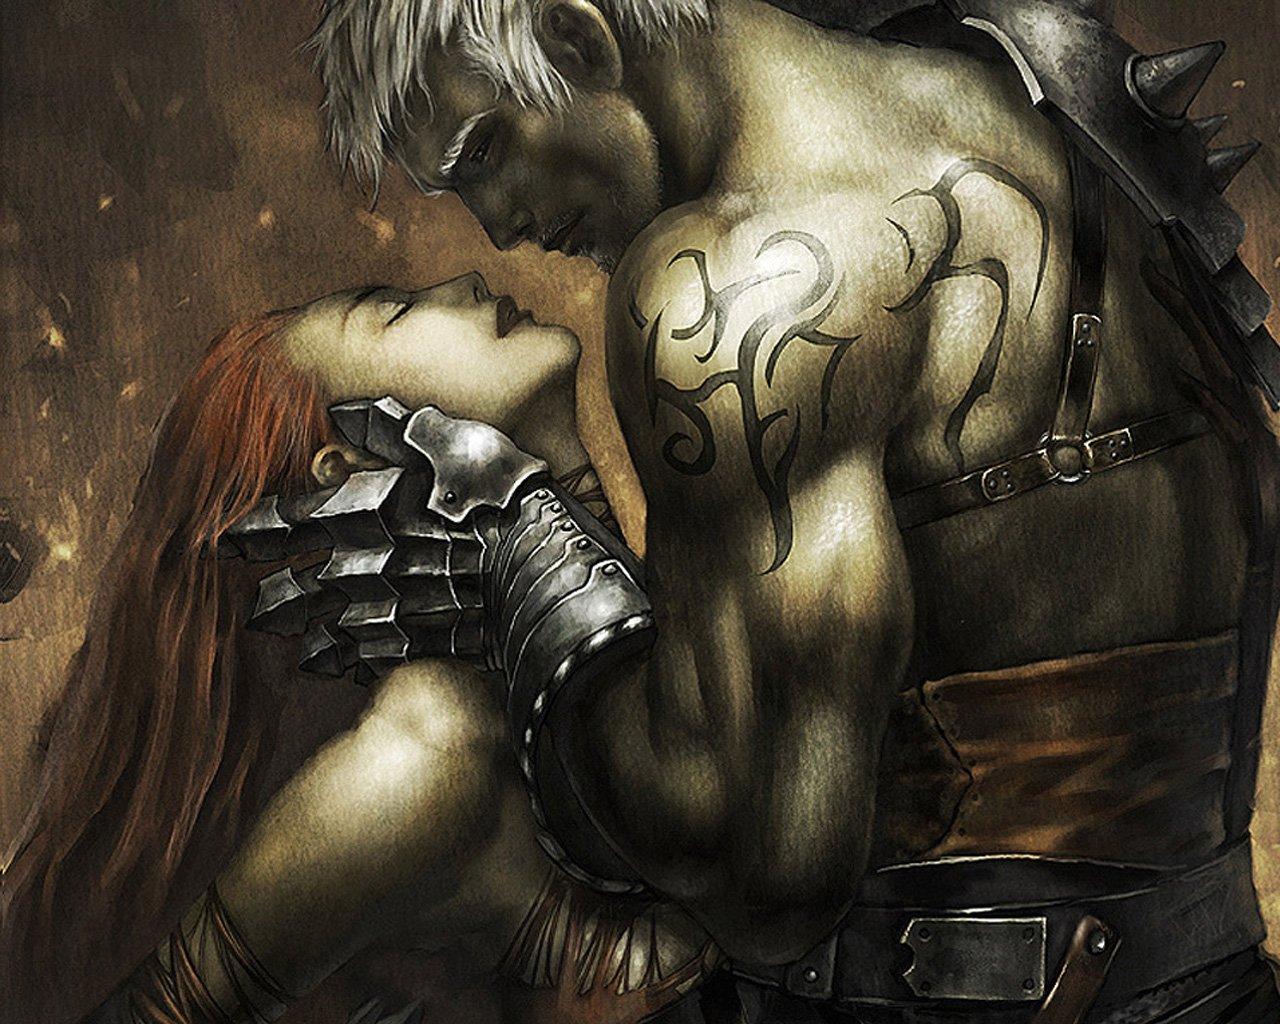 wallpaper love couple fantasy hd